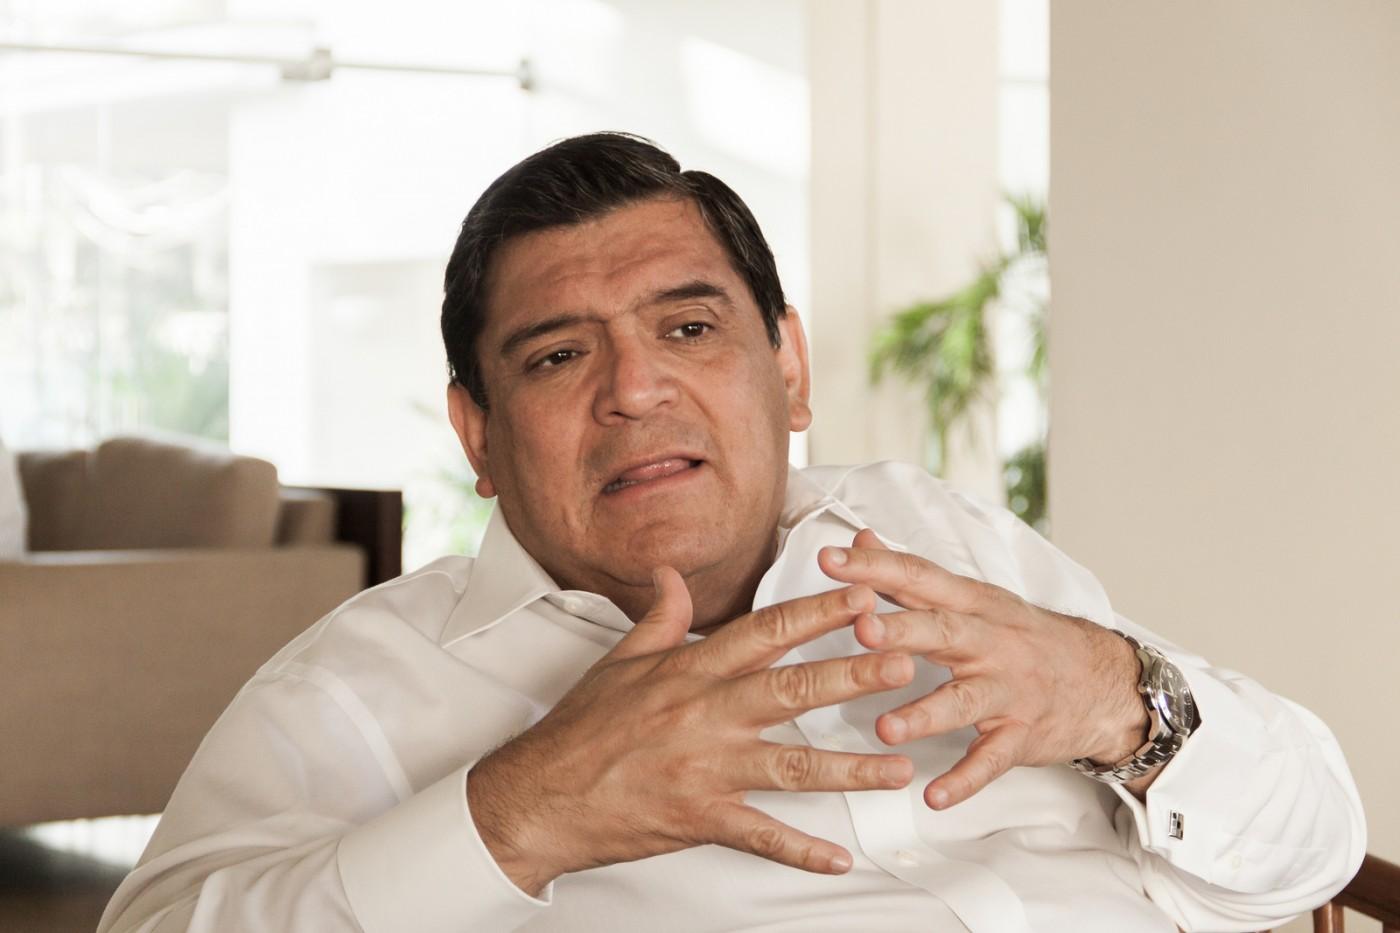 Juan Marthans